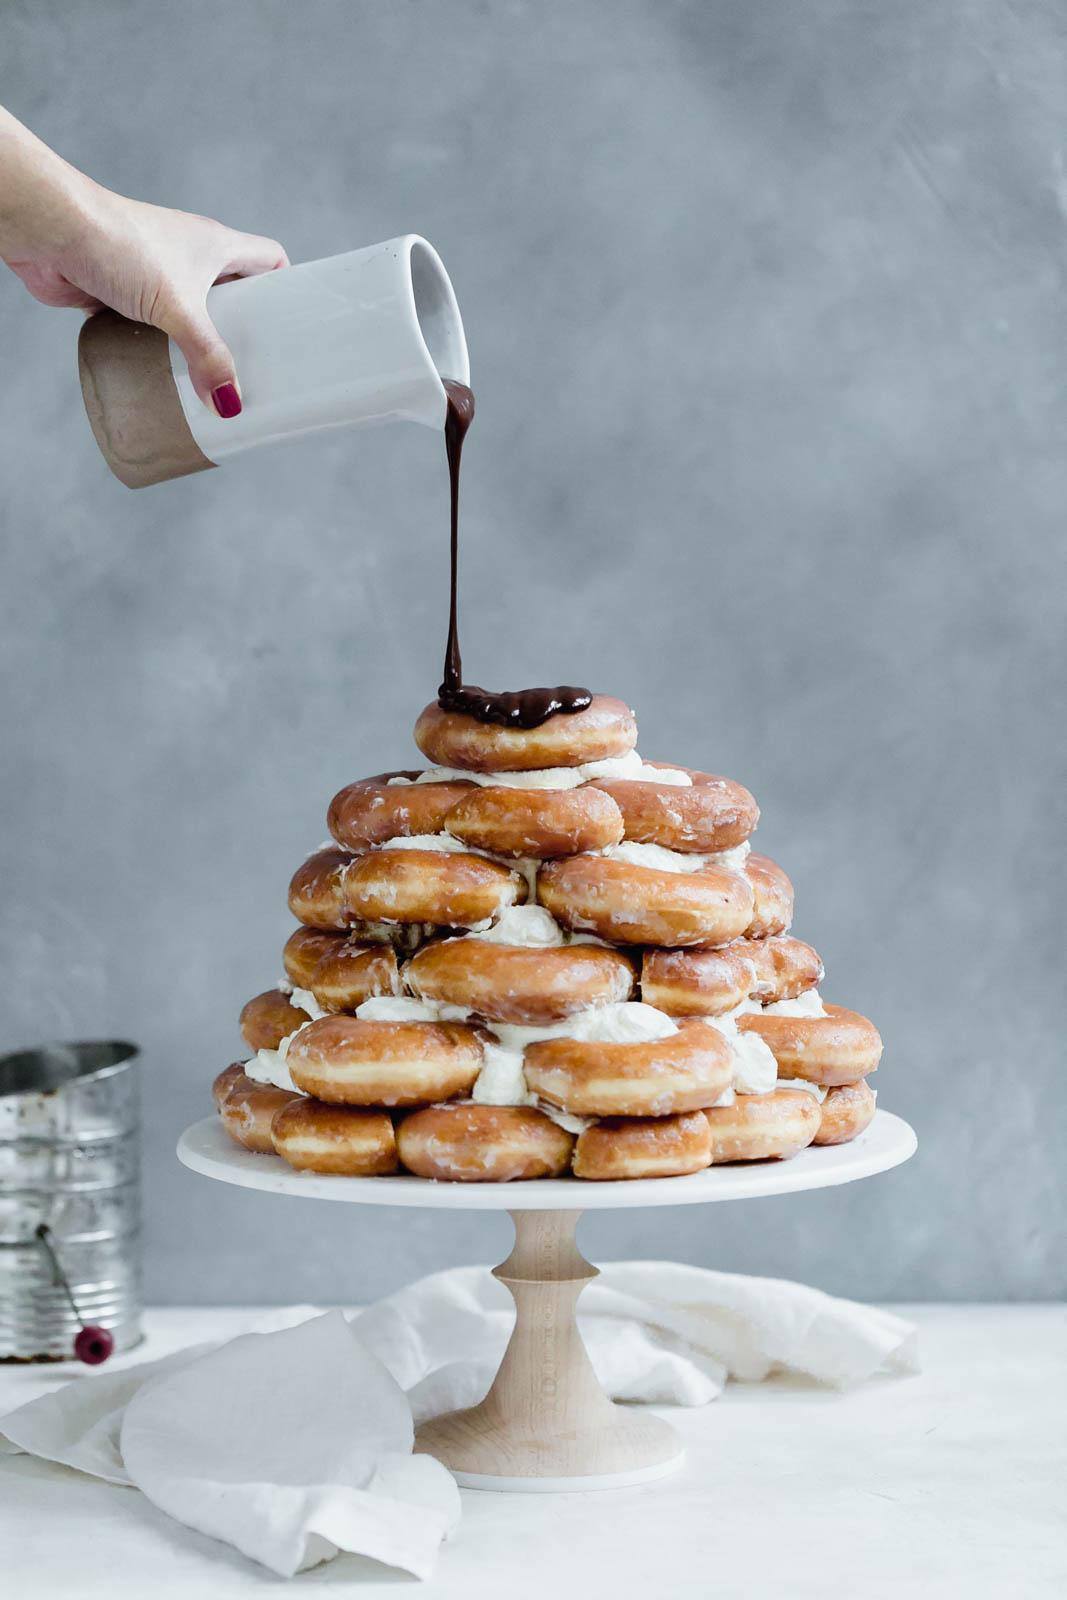 Towering Krispy Kreme donut cake smothered in chocolate frosting